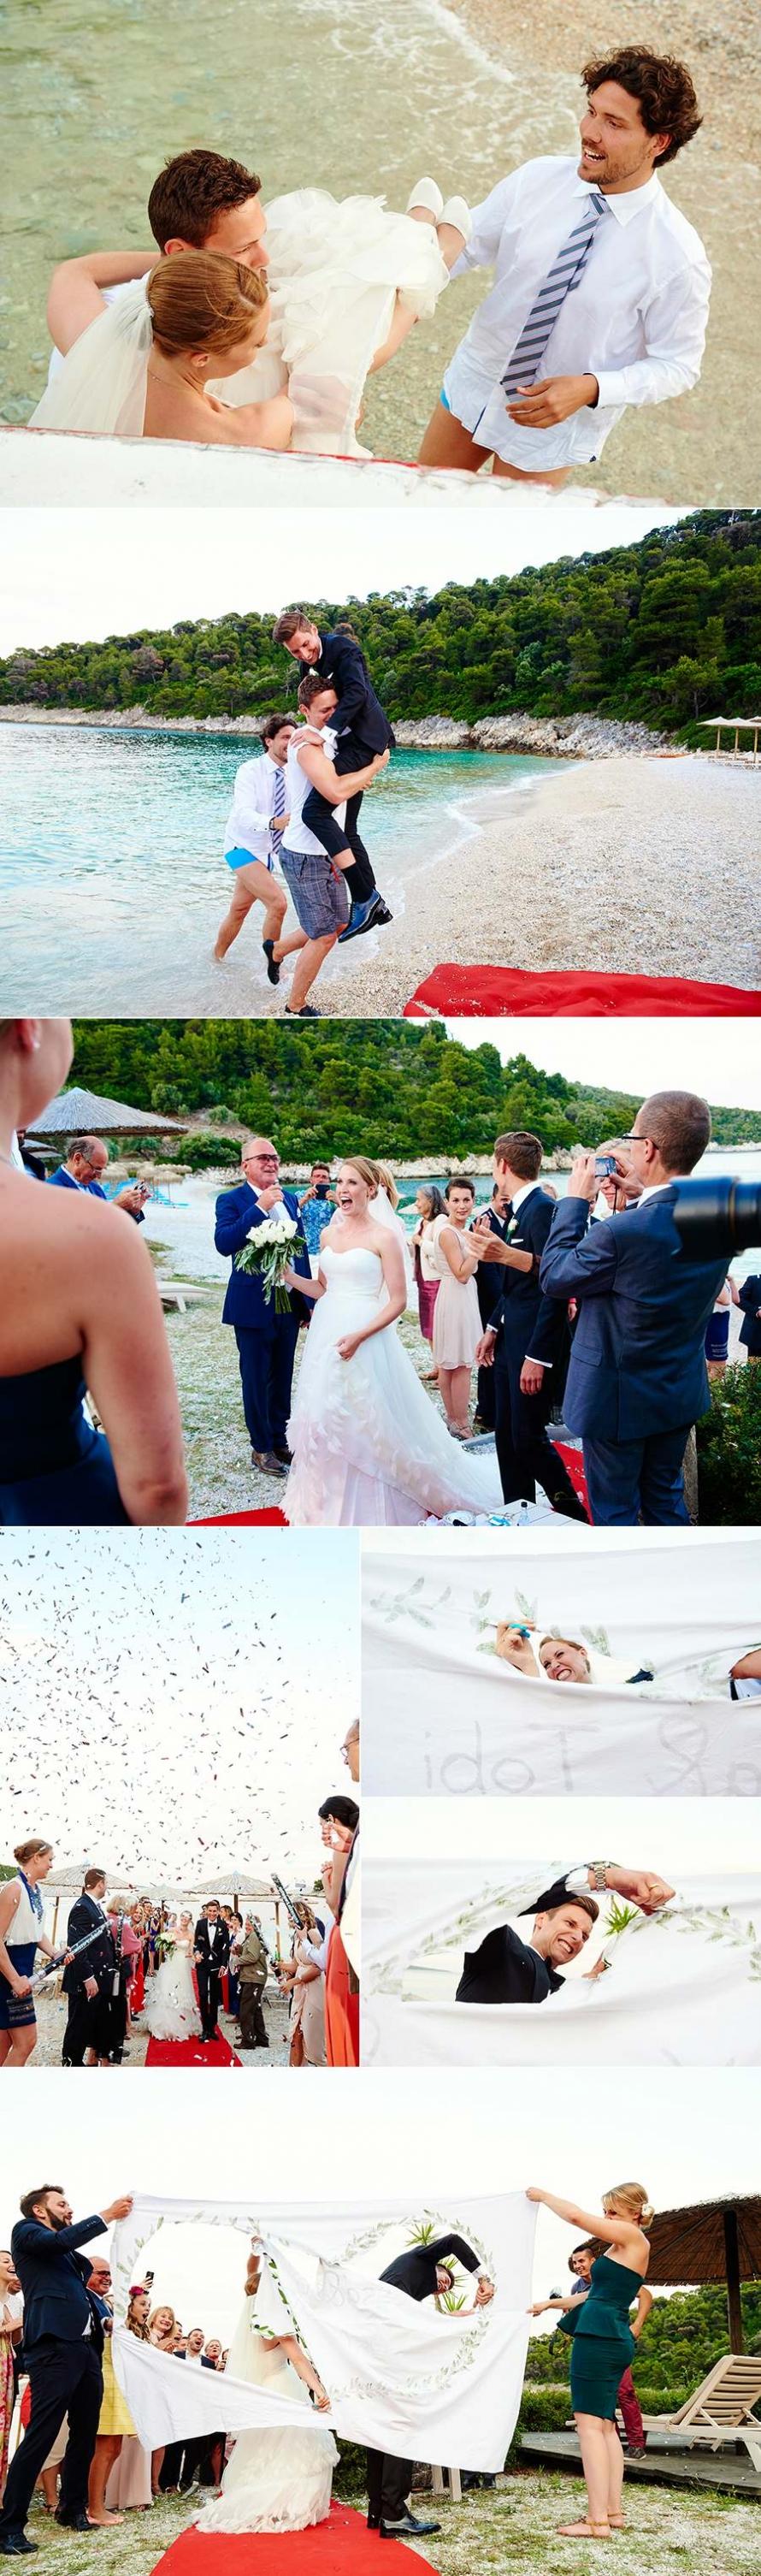 Tobi & Vanessa wedding photos 22